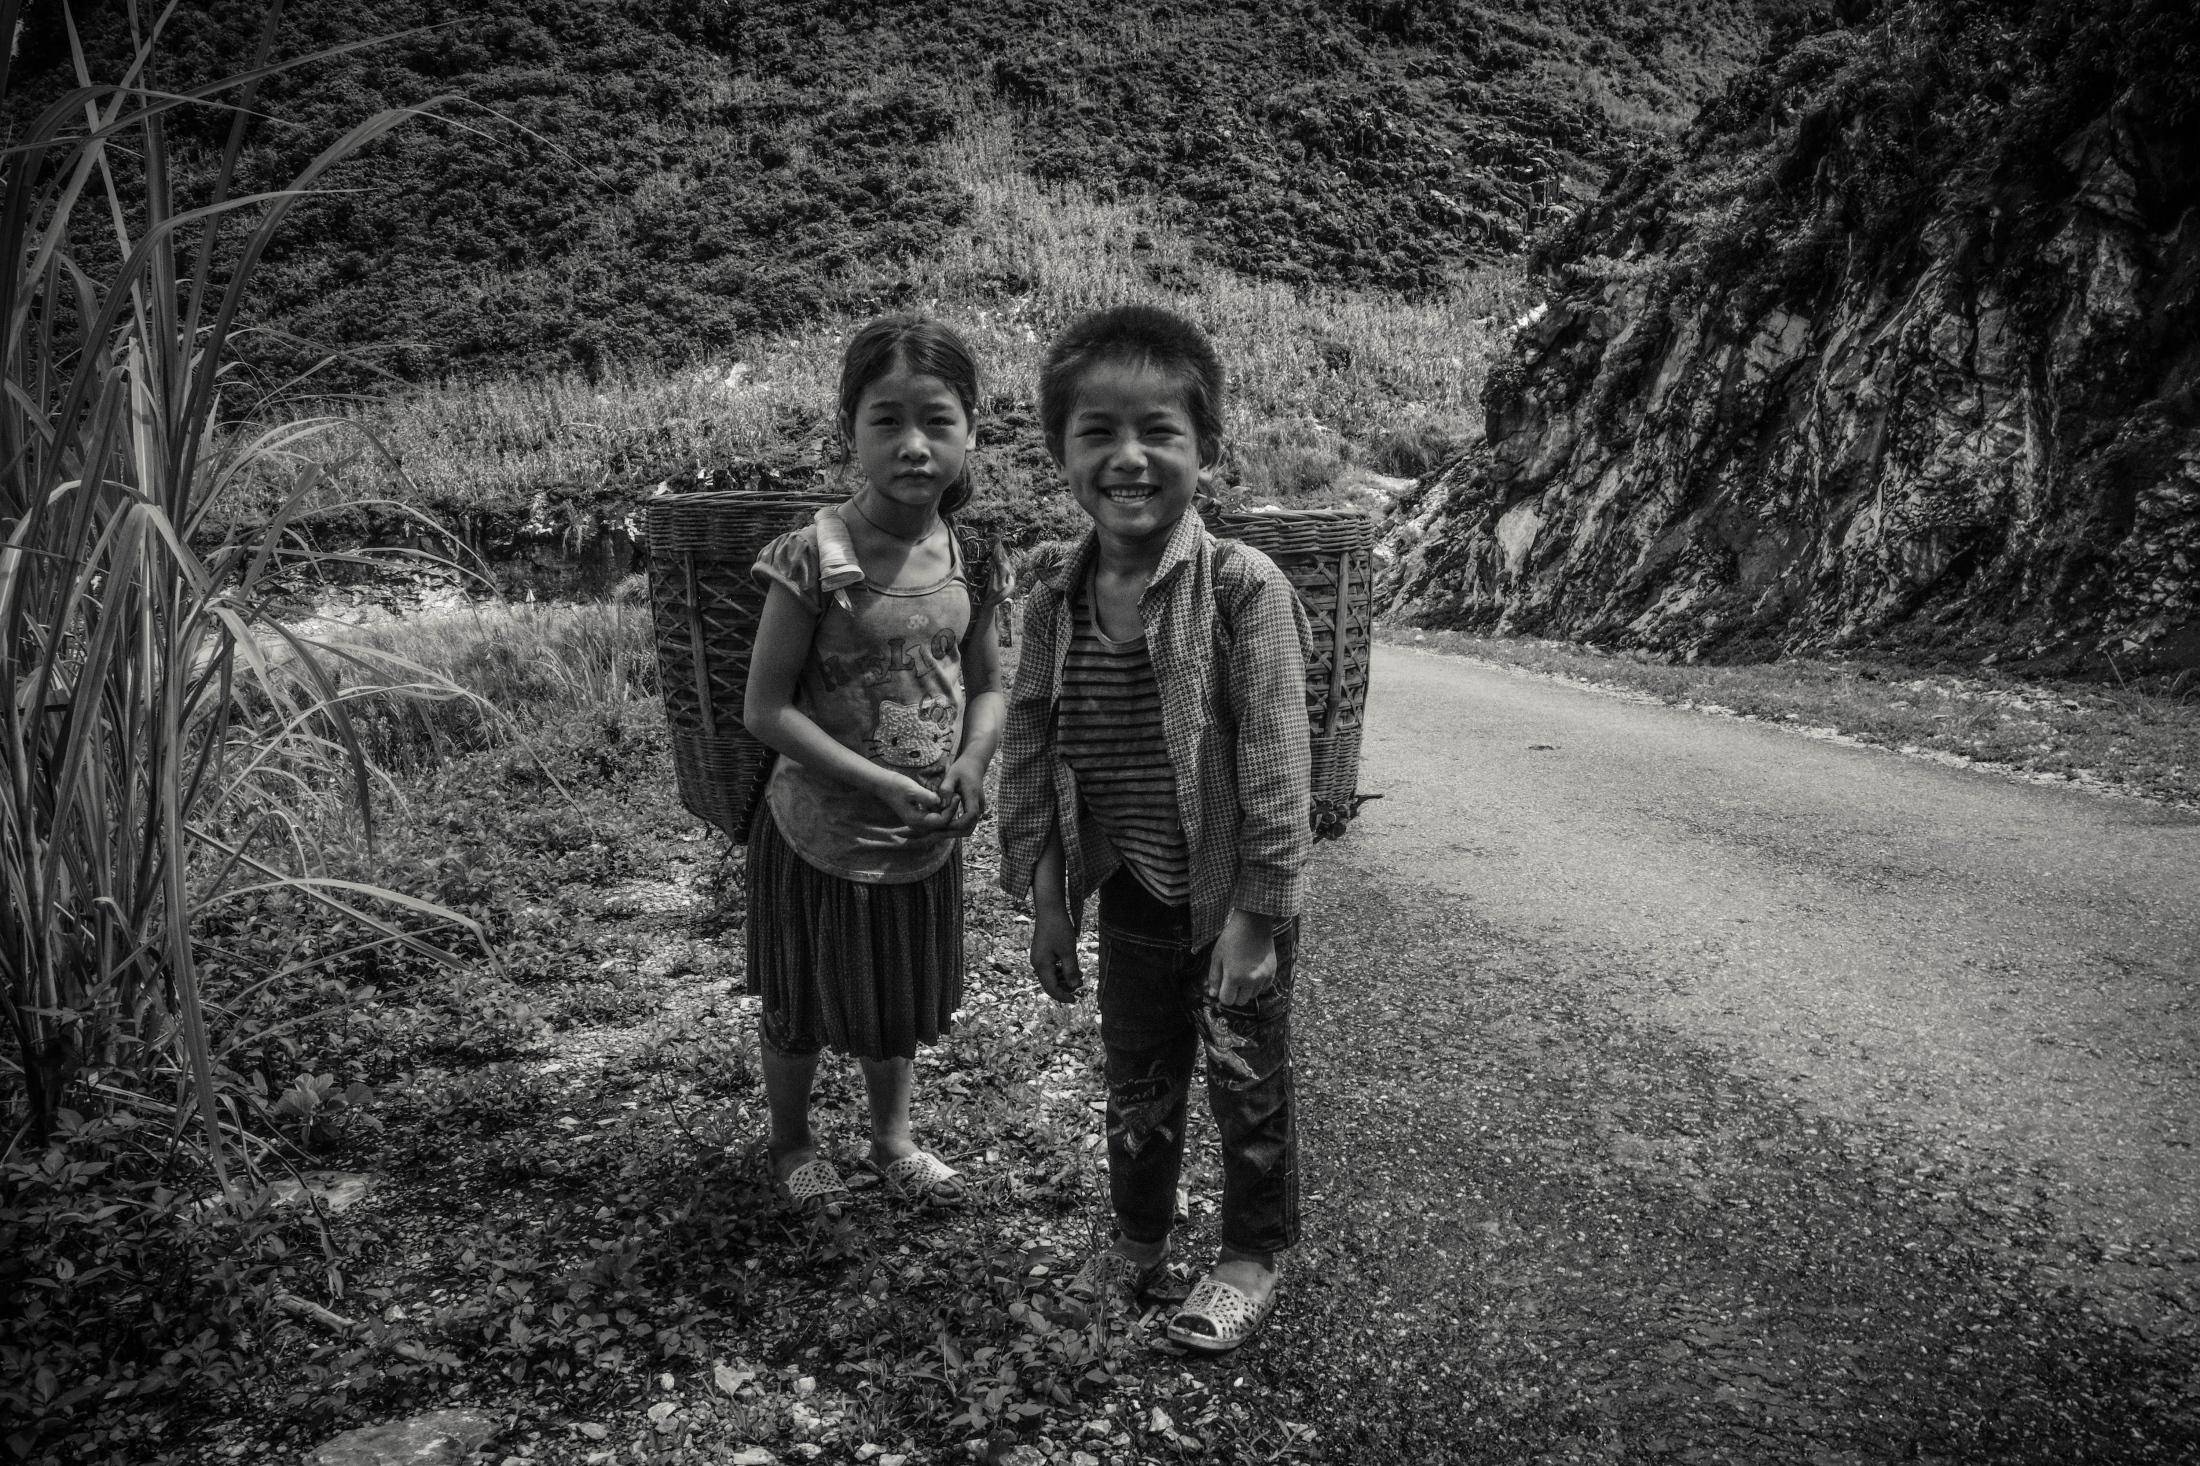 Photography image -  Hmong Children, Lung Ho, Vietnam